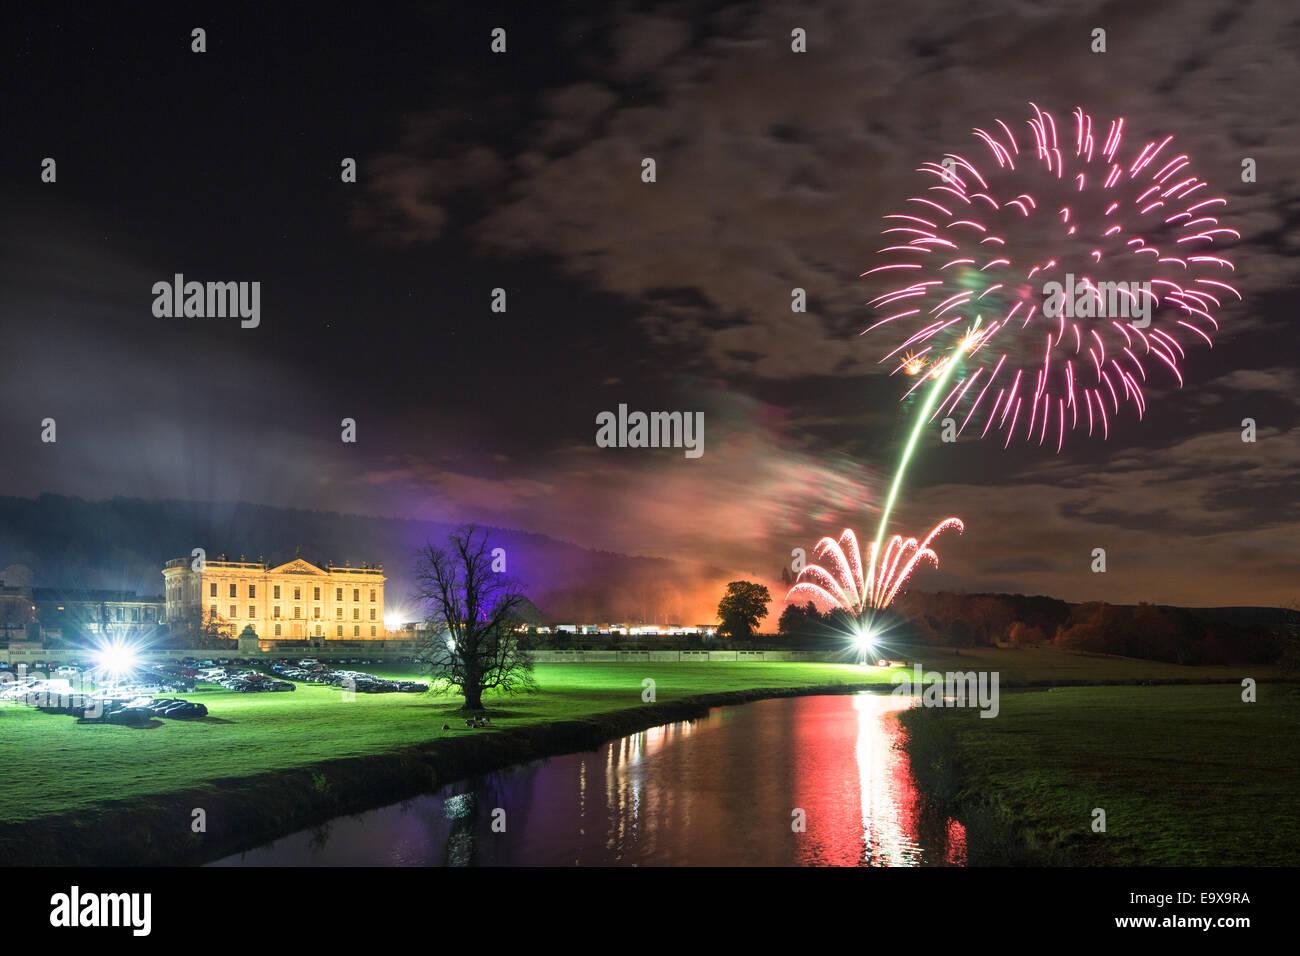 Chatsworth, UK, 2nd November 2014. A spectacular firework display illuminates the skies above Chatsworth House, Stock Photo